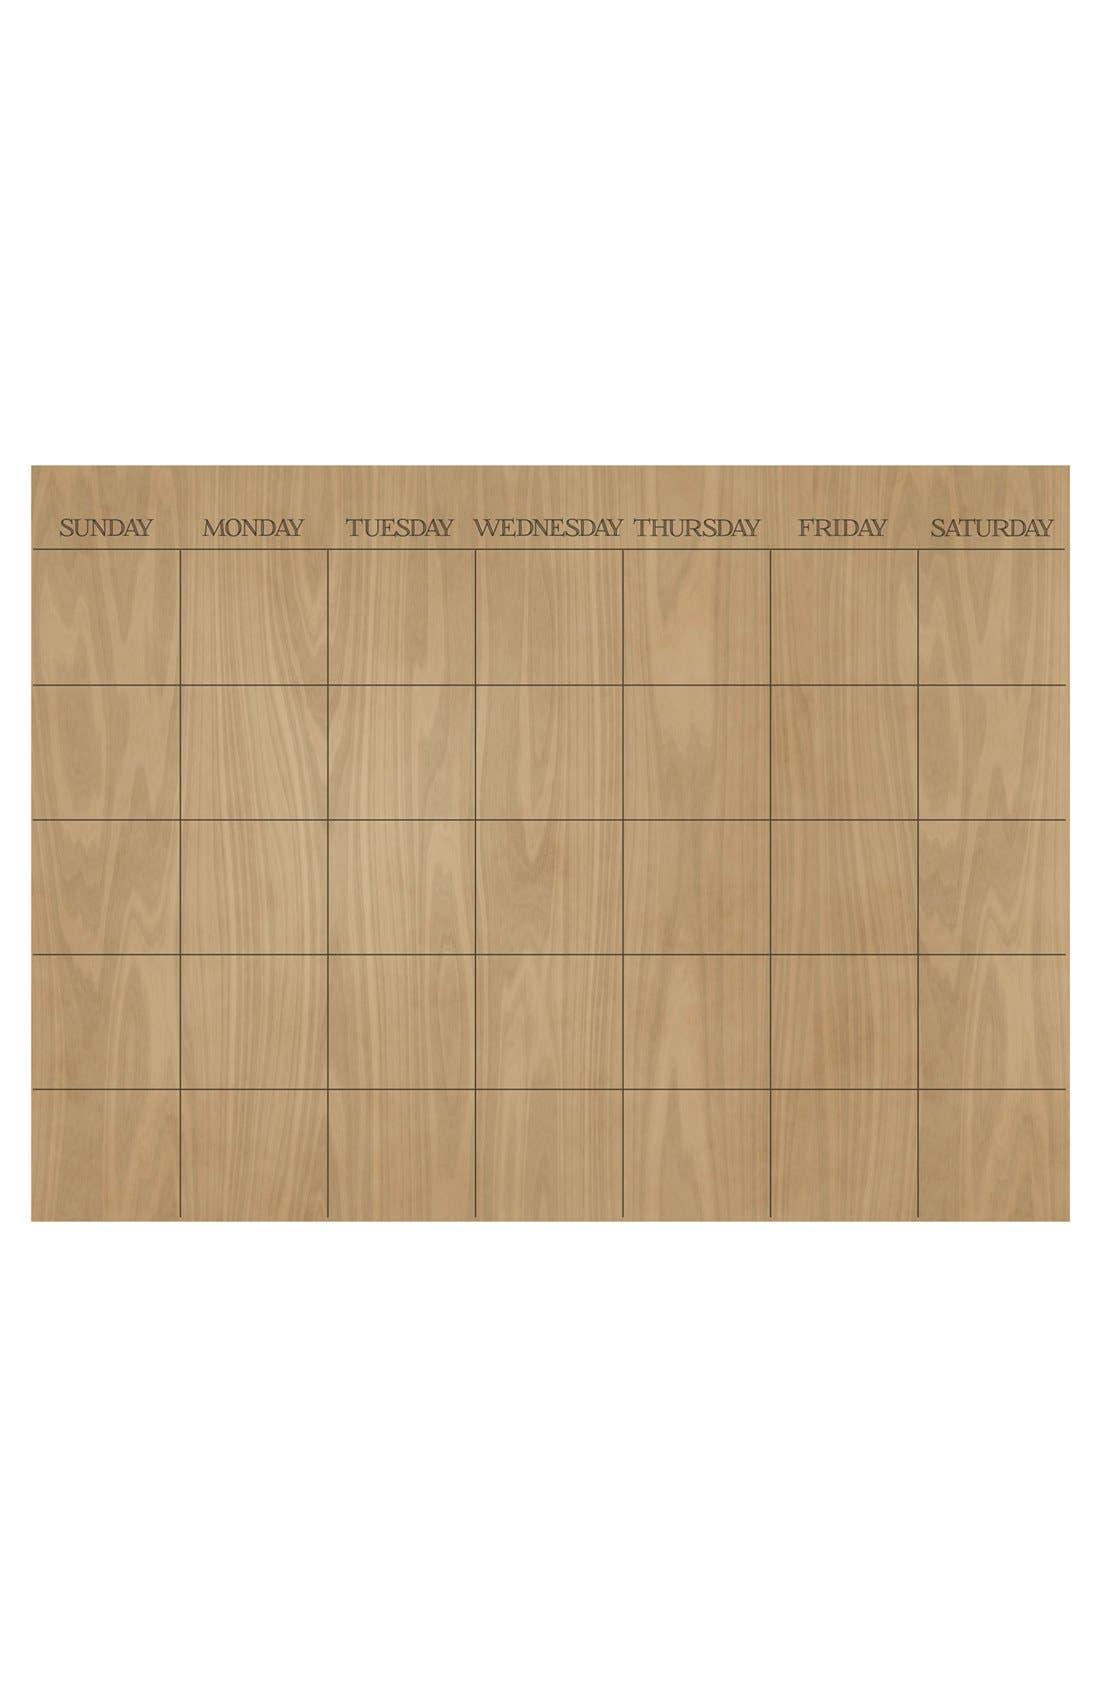 Wallpops 'Hardwood' Monthly Dry Erase Calendar